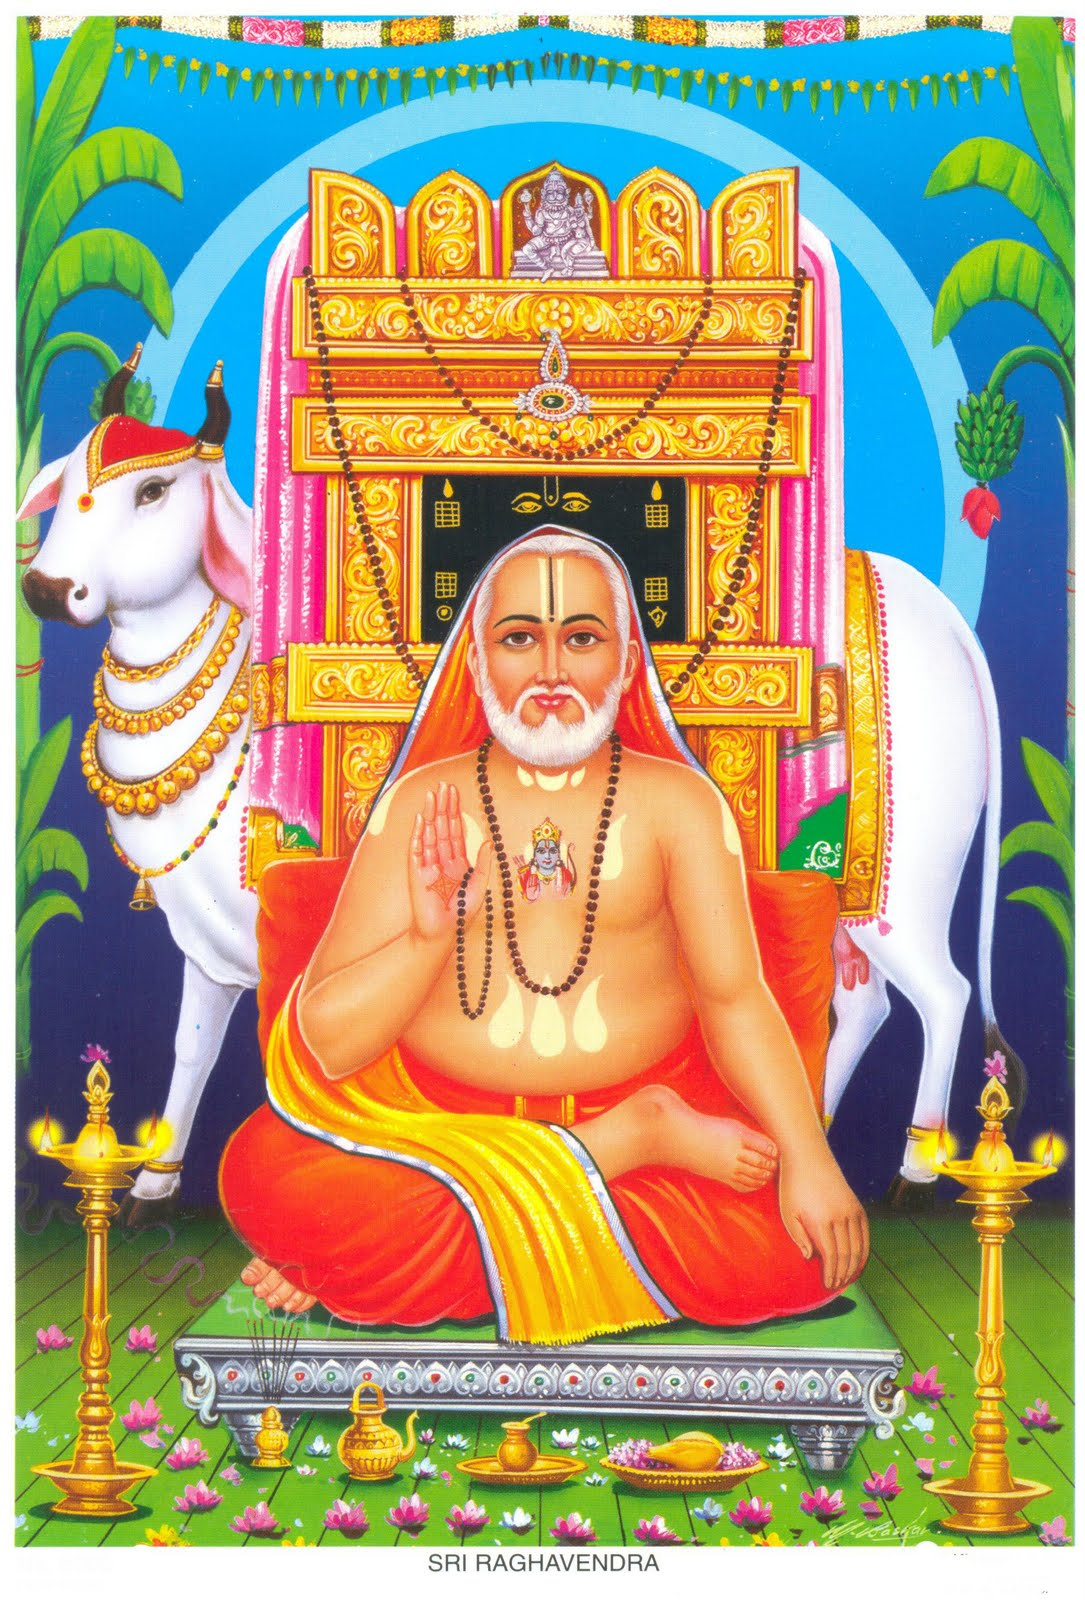 Shree Raghavendra Swamy Jyotishalaya